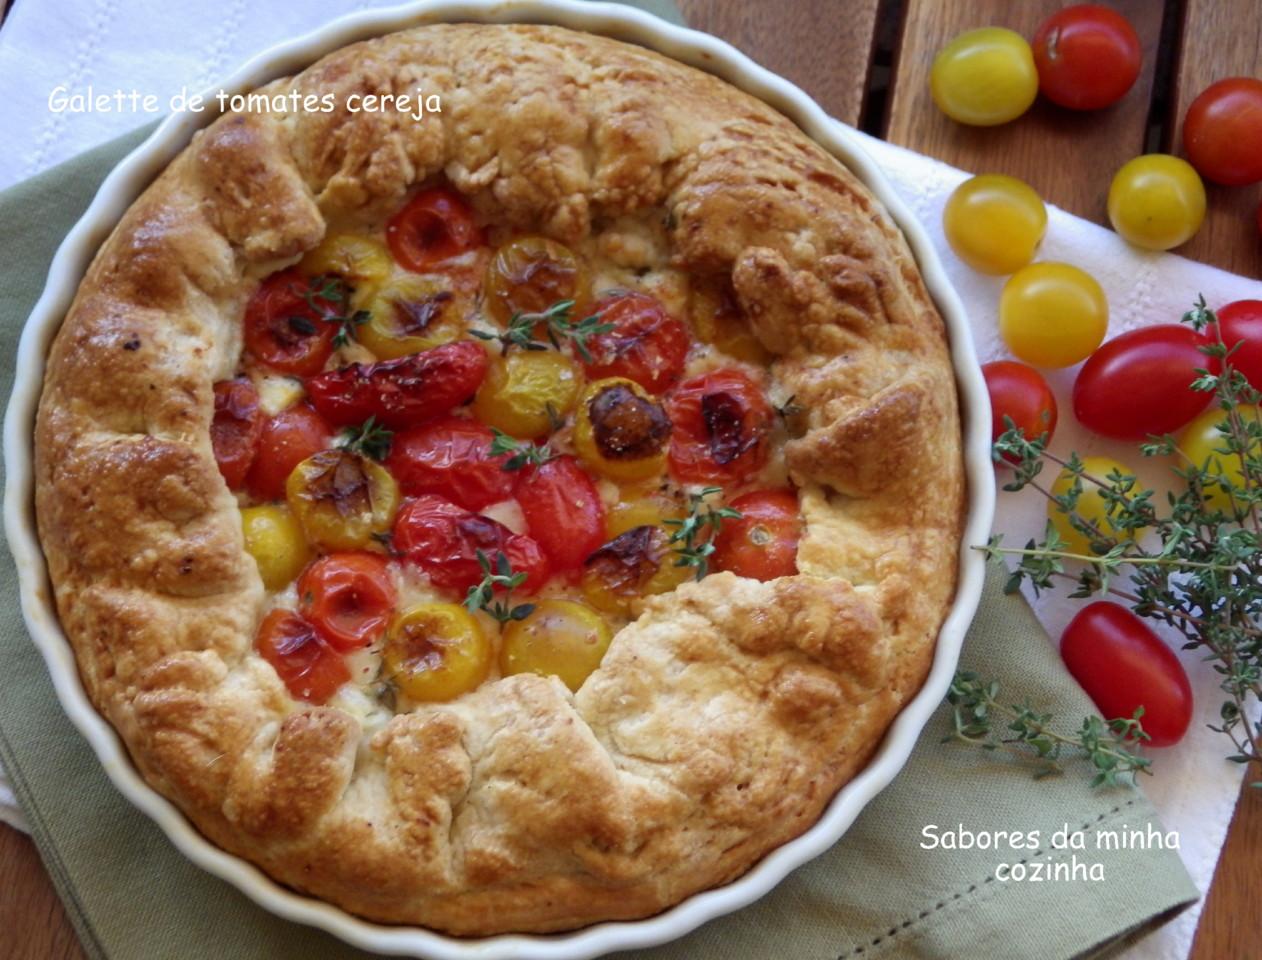 IMGP8214-Galette de tomates cereja-Blog.JPG